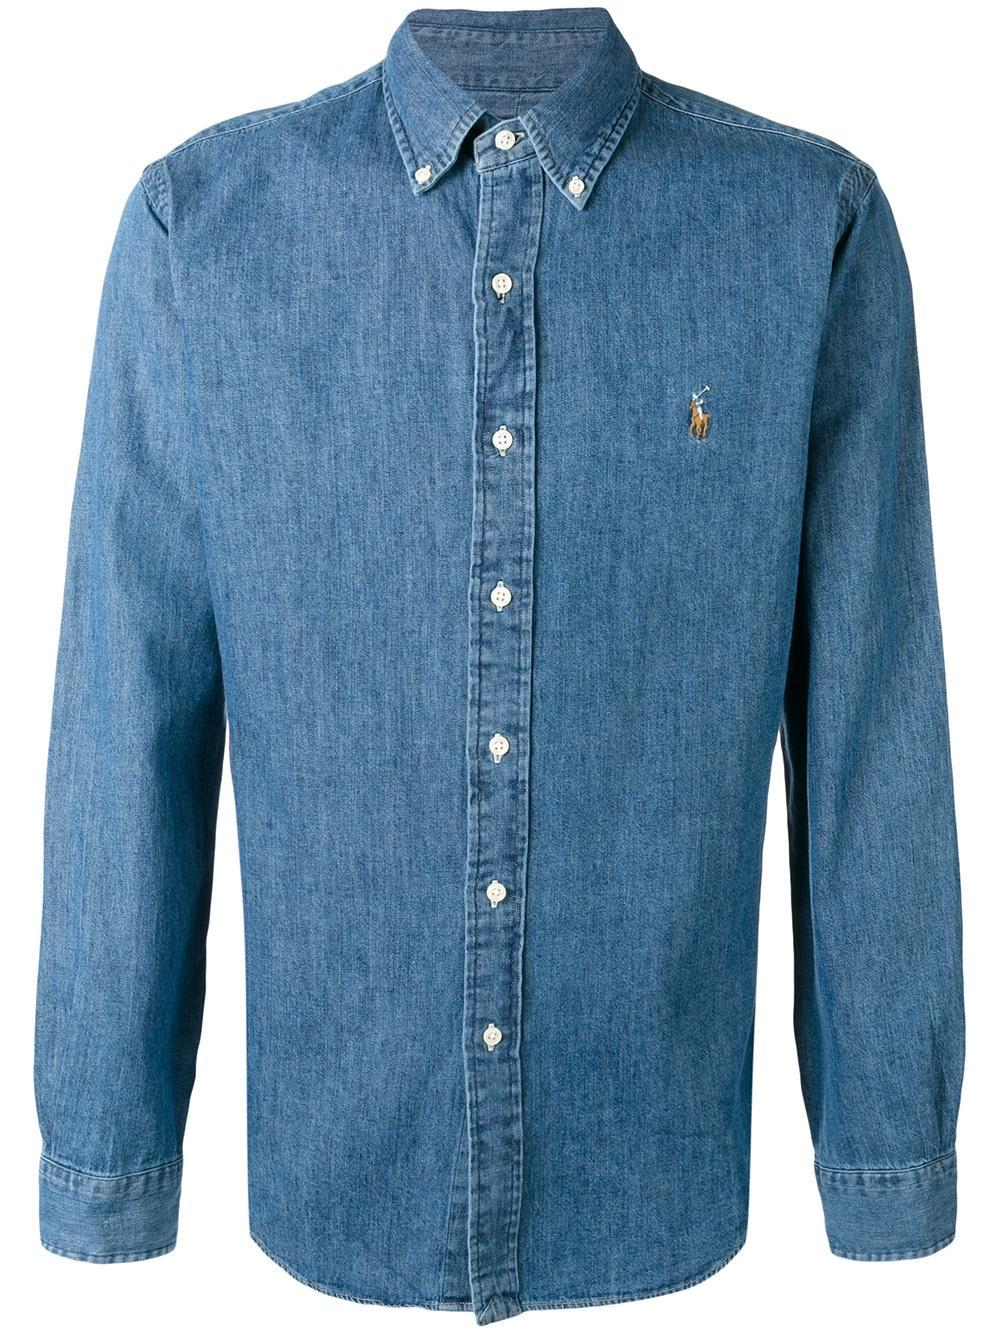 Lyst polo ralph lauren button down denim shirt in blue for Denim button down shirts